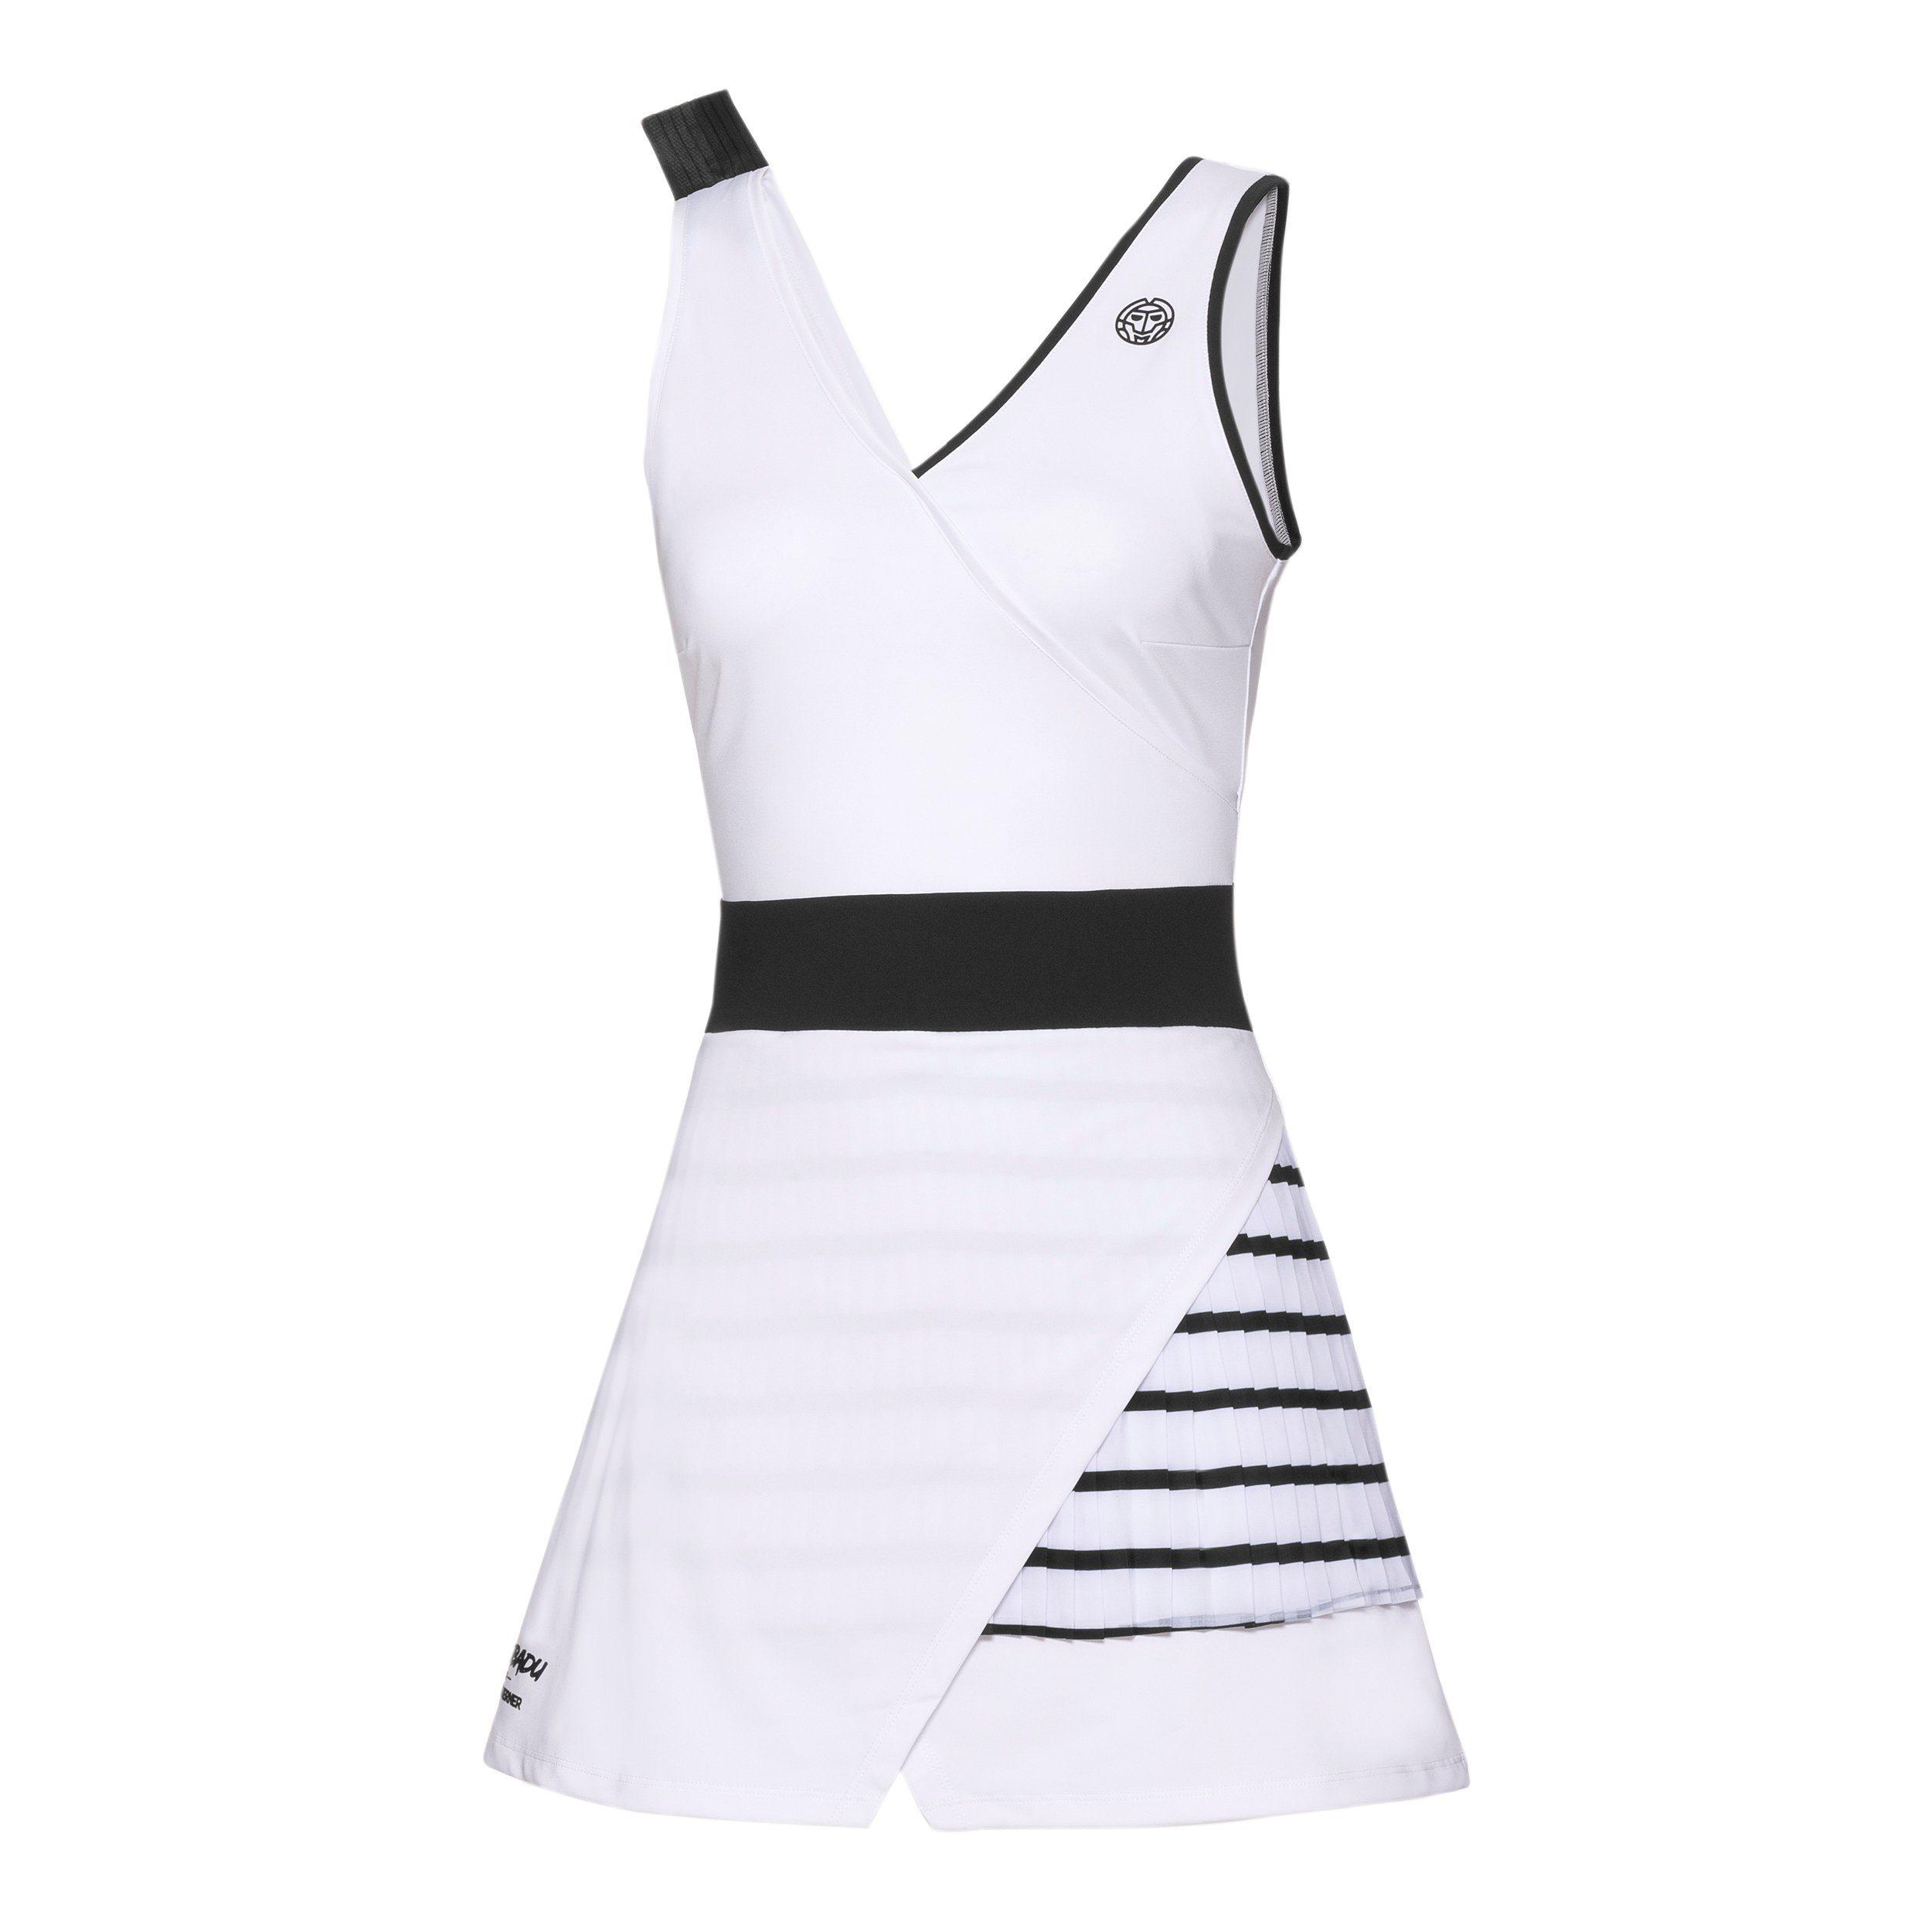 BIDI BADU Tennis Kleid mit innovativem 3 in 1 System